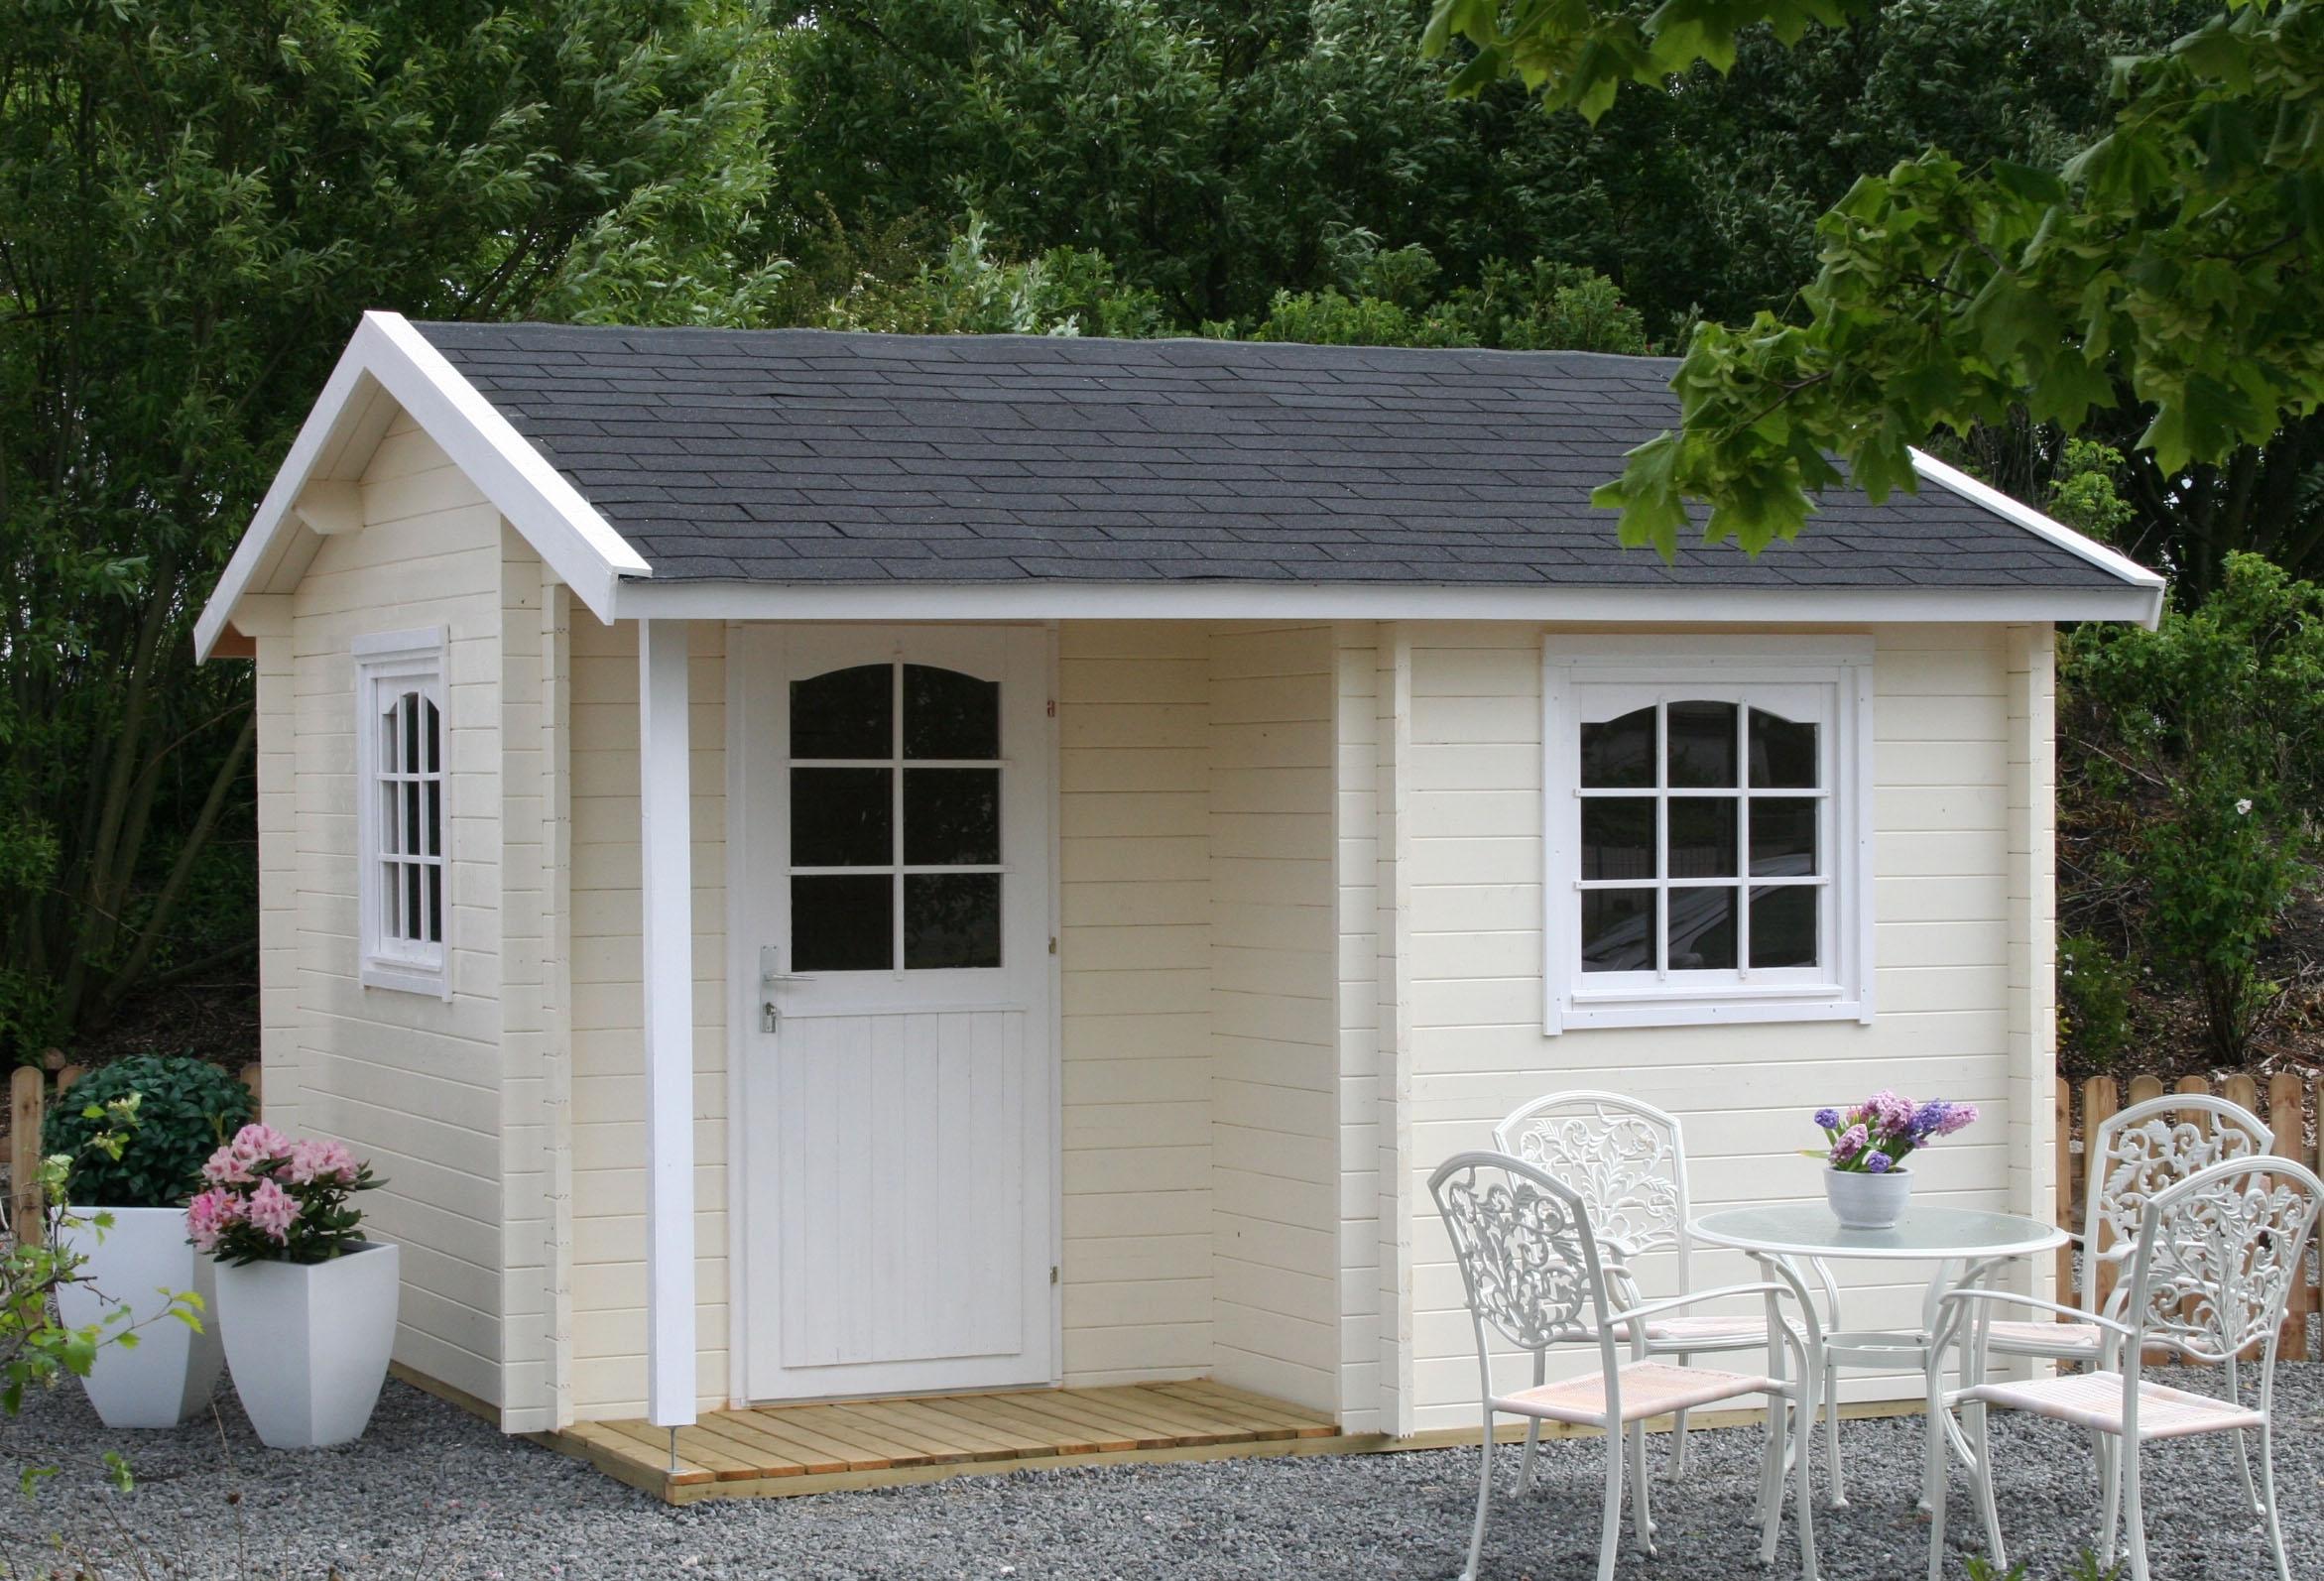 gartenhaus modell mallorca 28. Black Bedroom Furniture Sets. Home Design Ideas